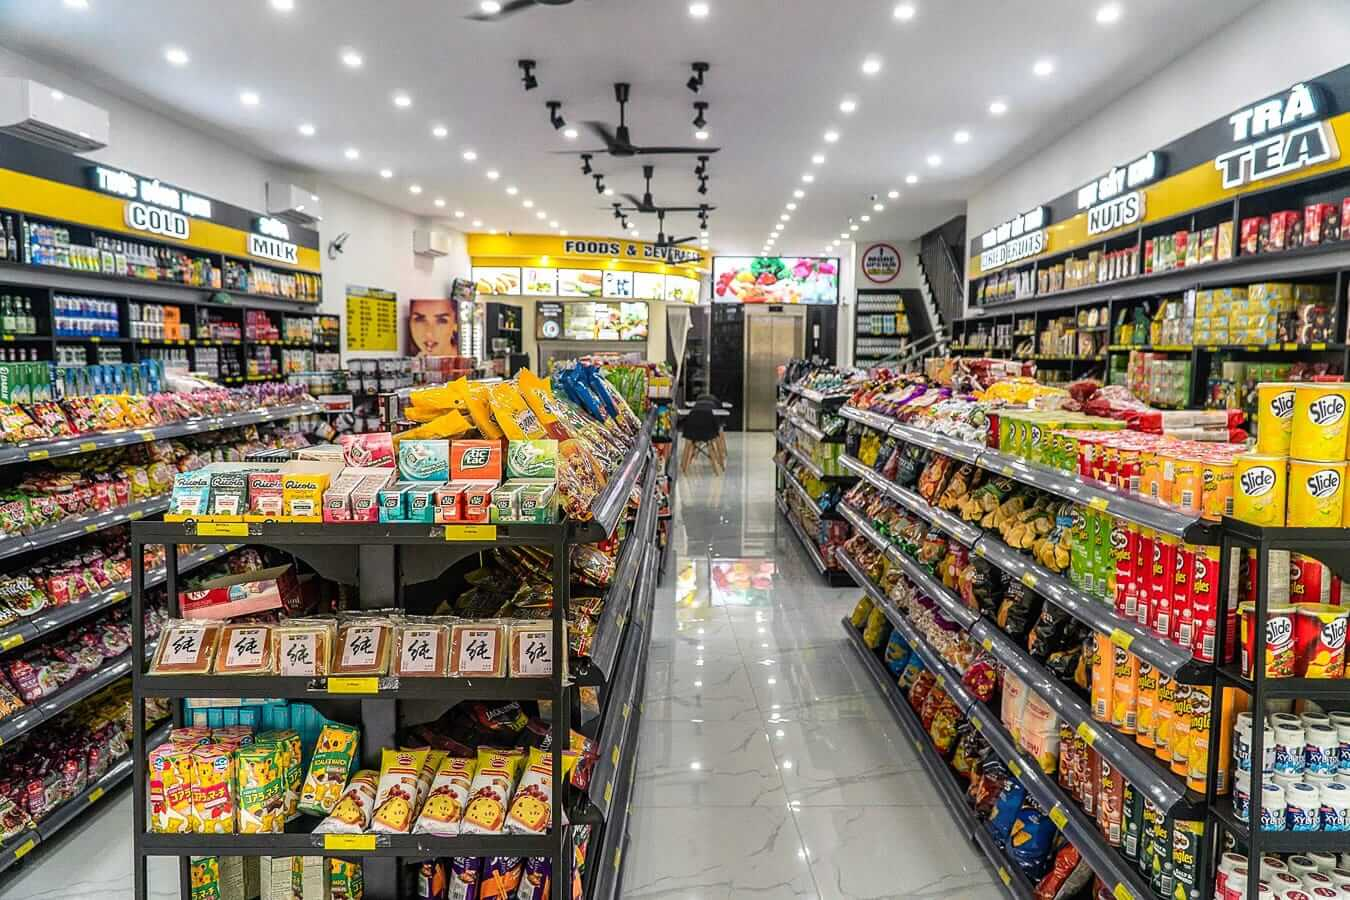 Hoi An supermarket